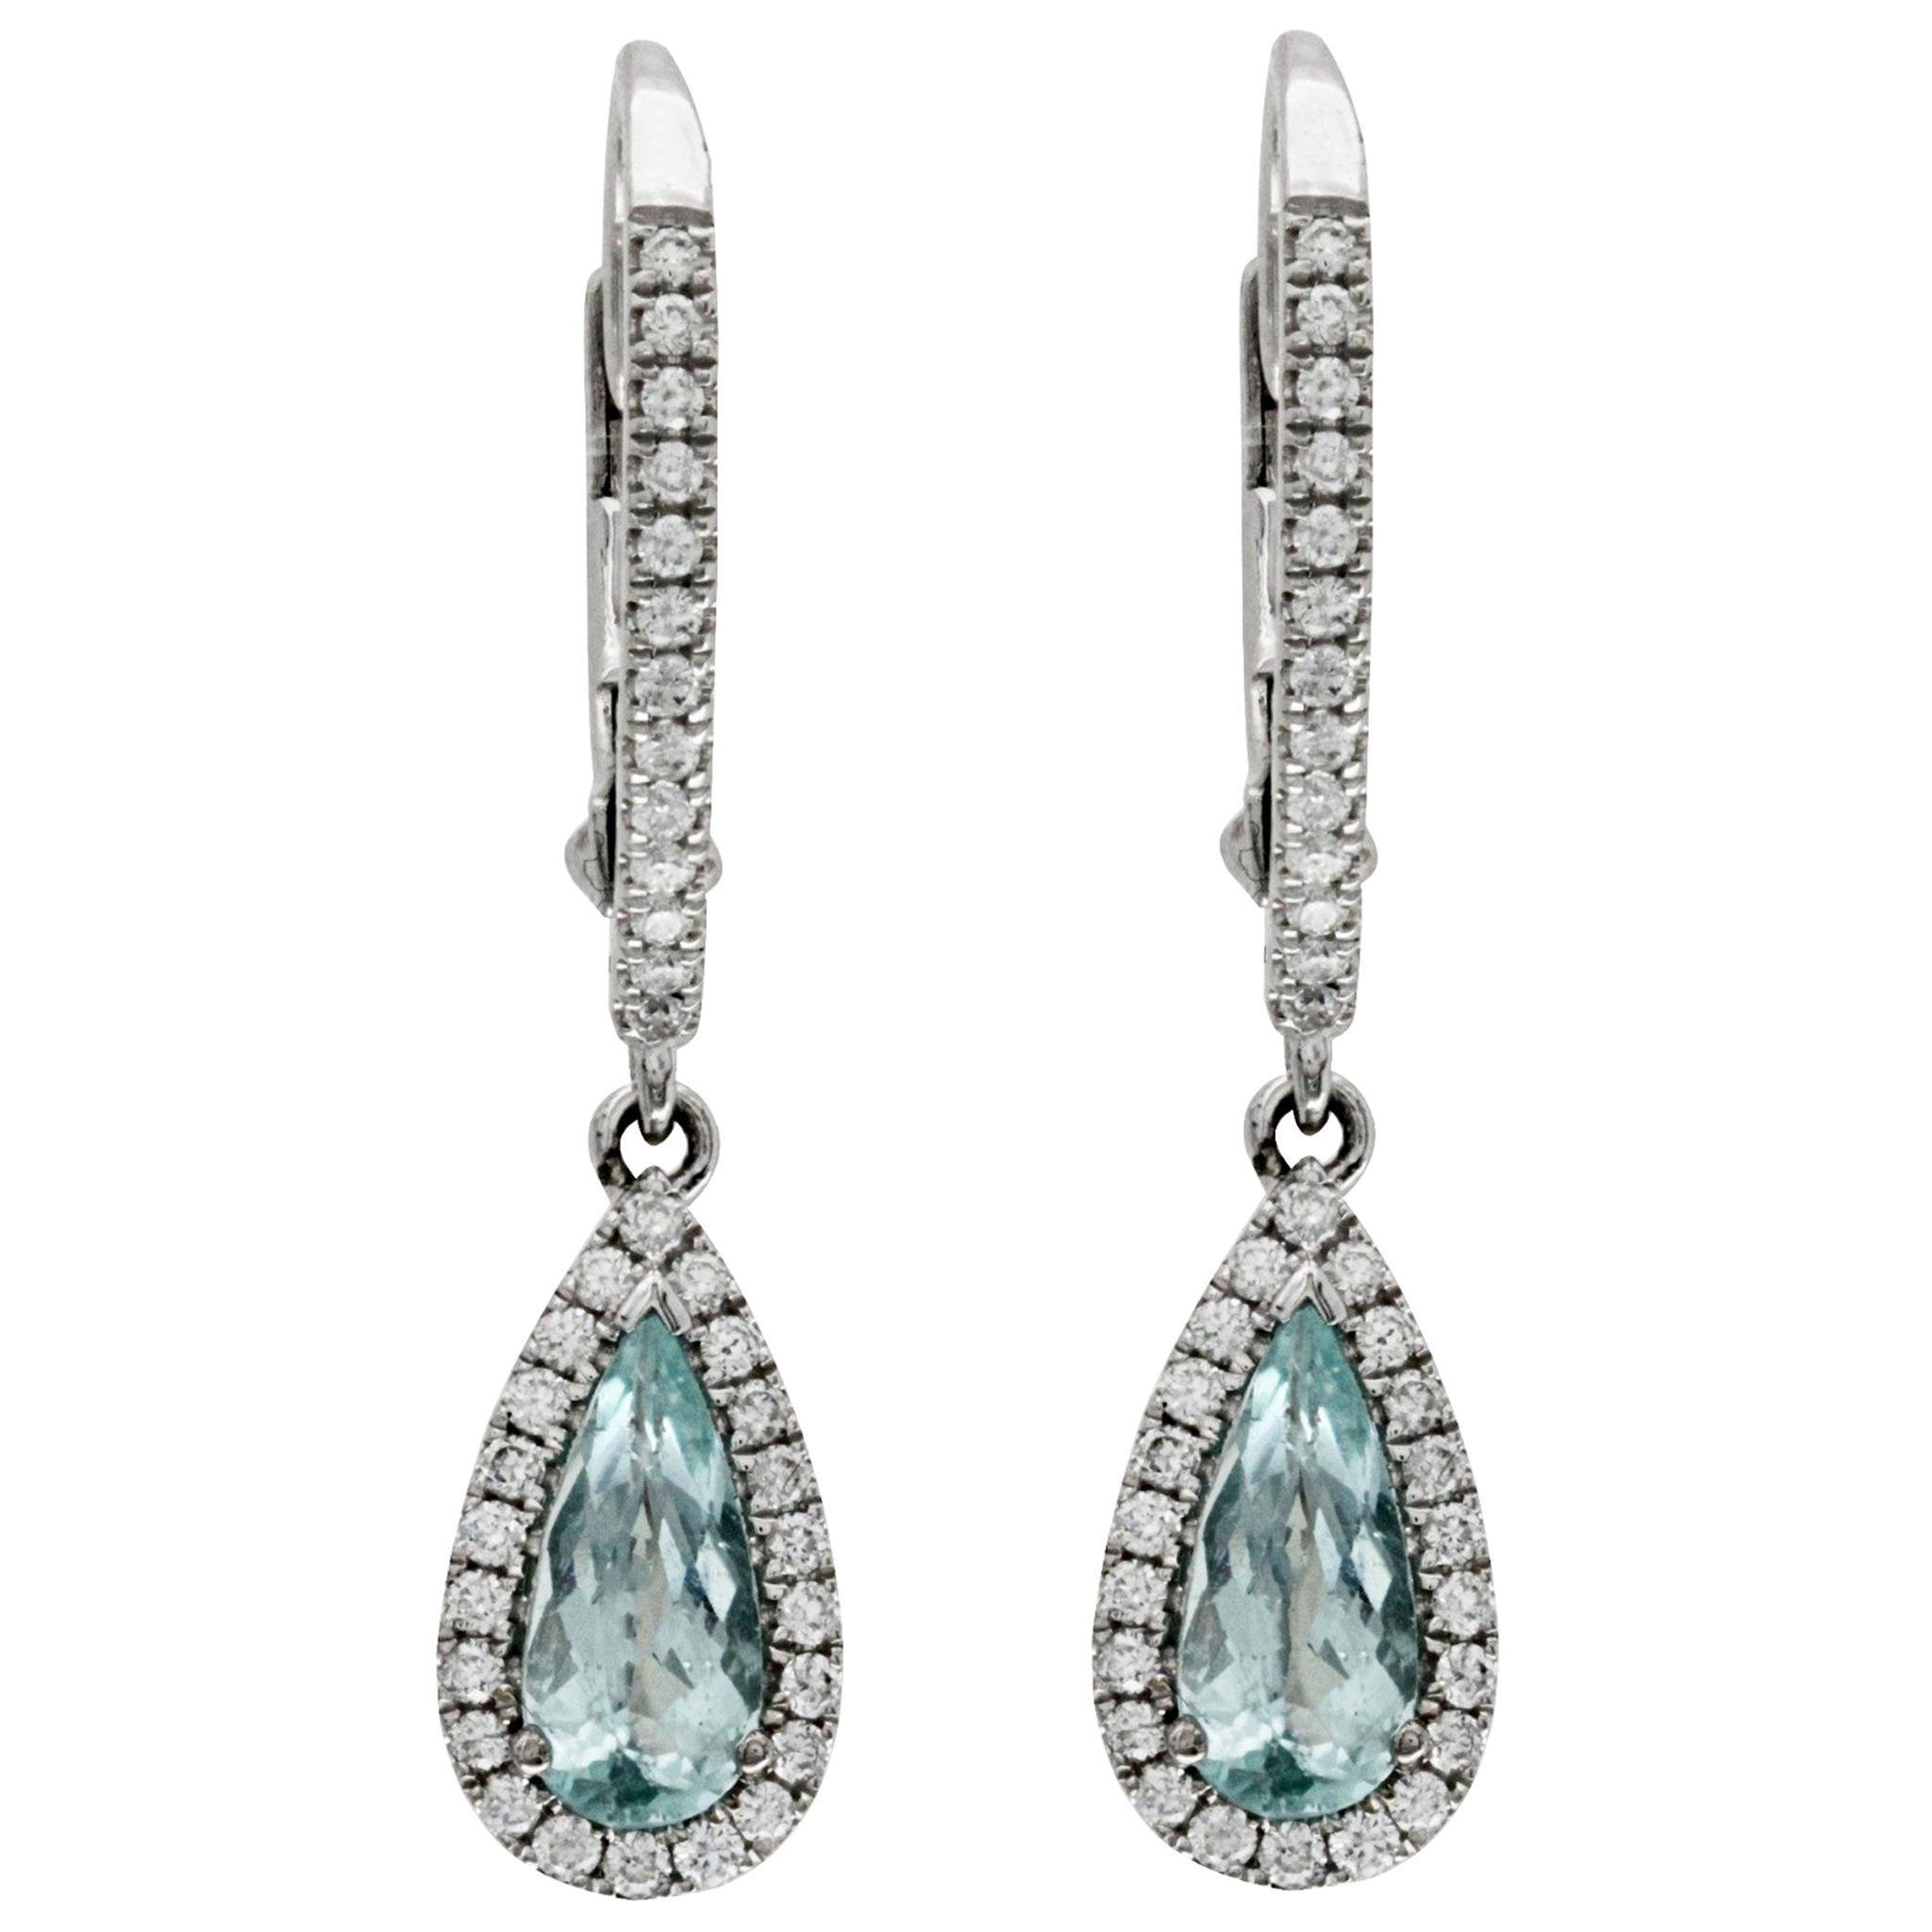 0.39 Carat Paraiba and 0.35 Carat Diamonds 14 Karat White Gold Dangle Earrings